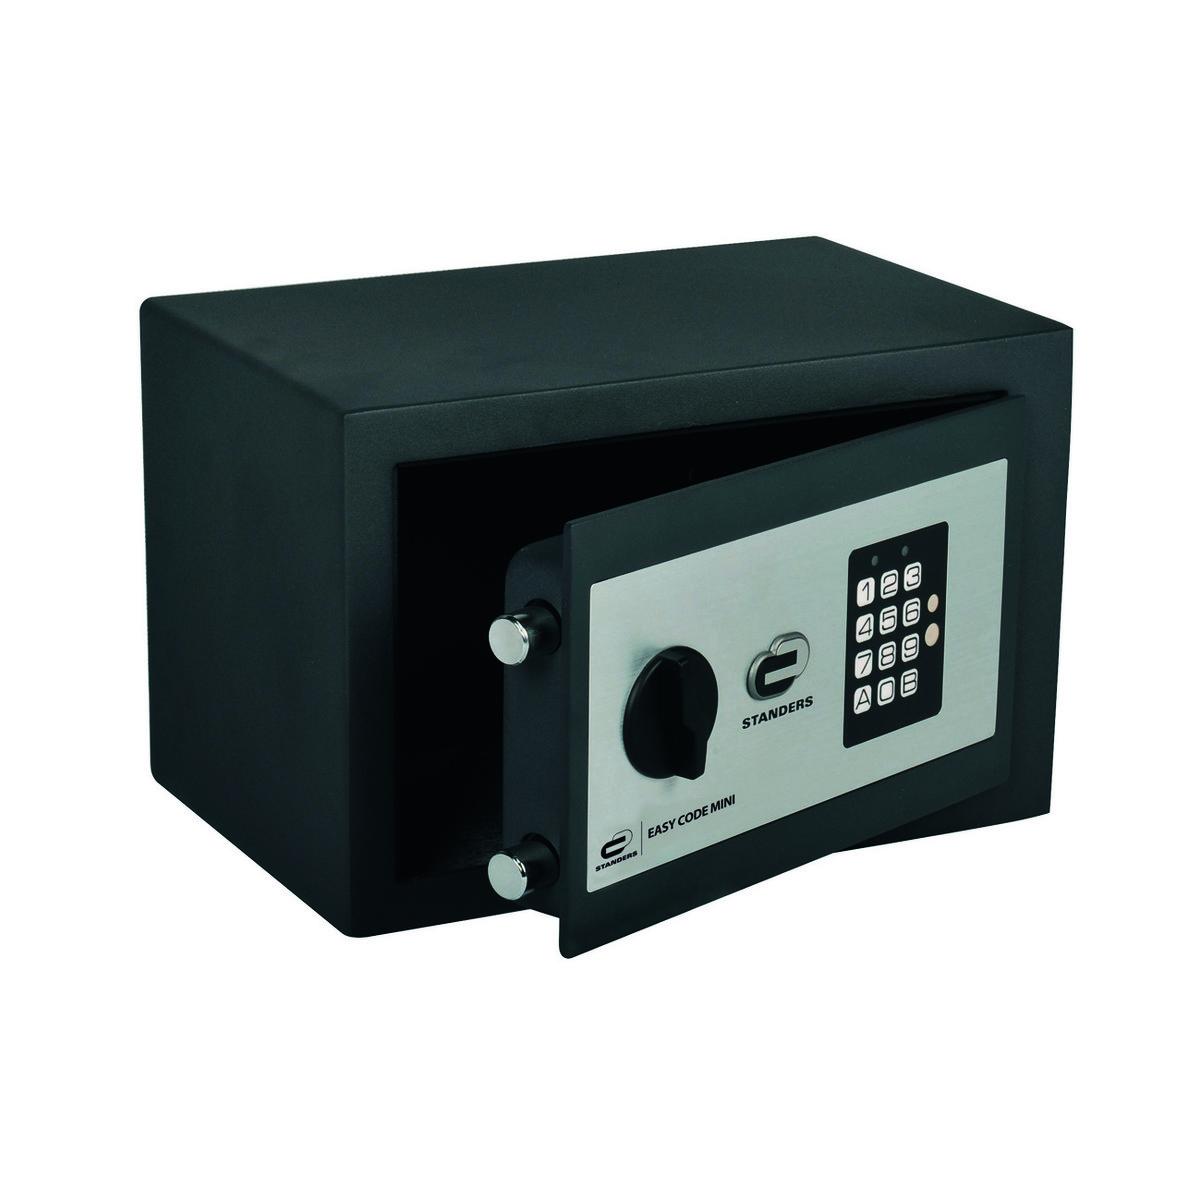 Cassaforte a mobile Standers